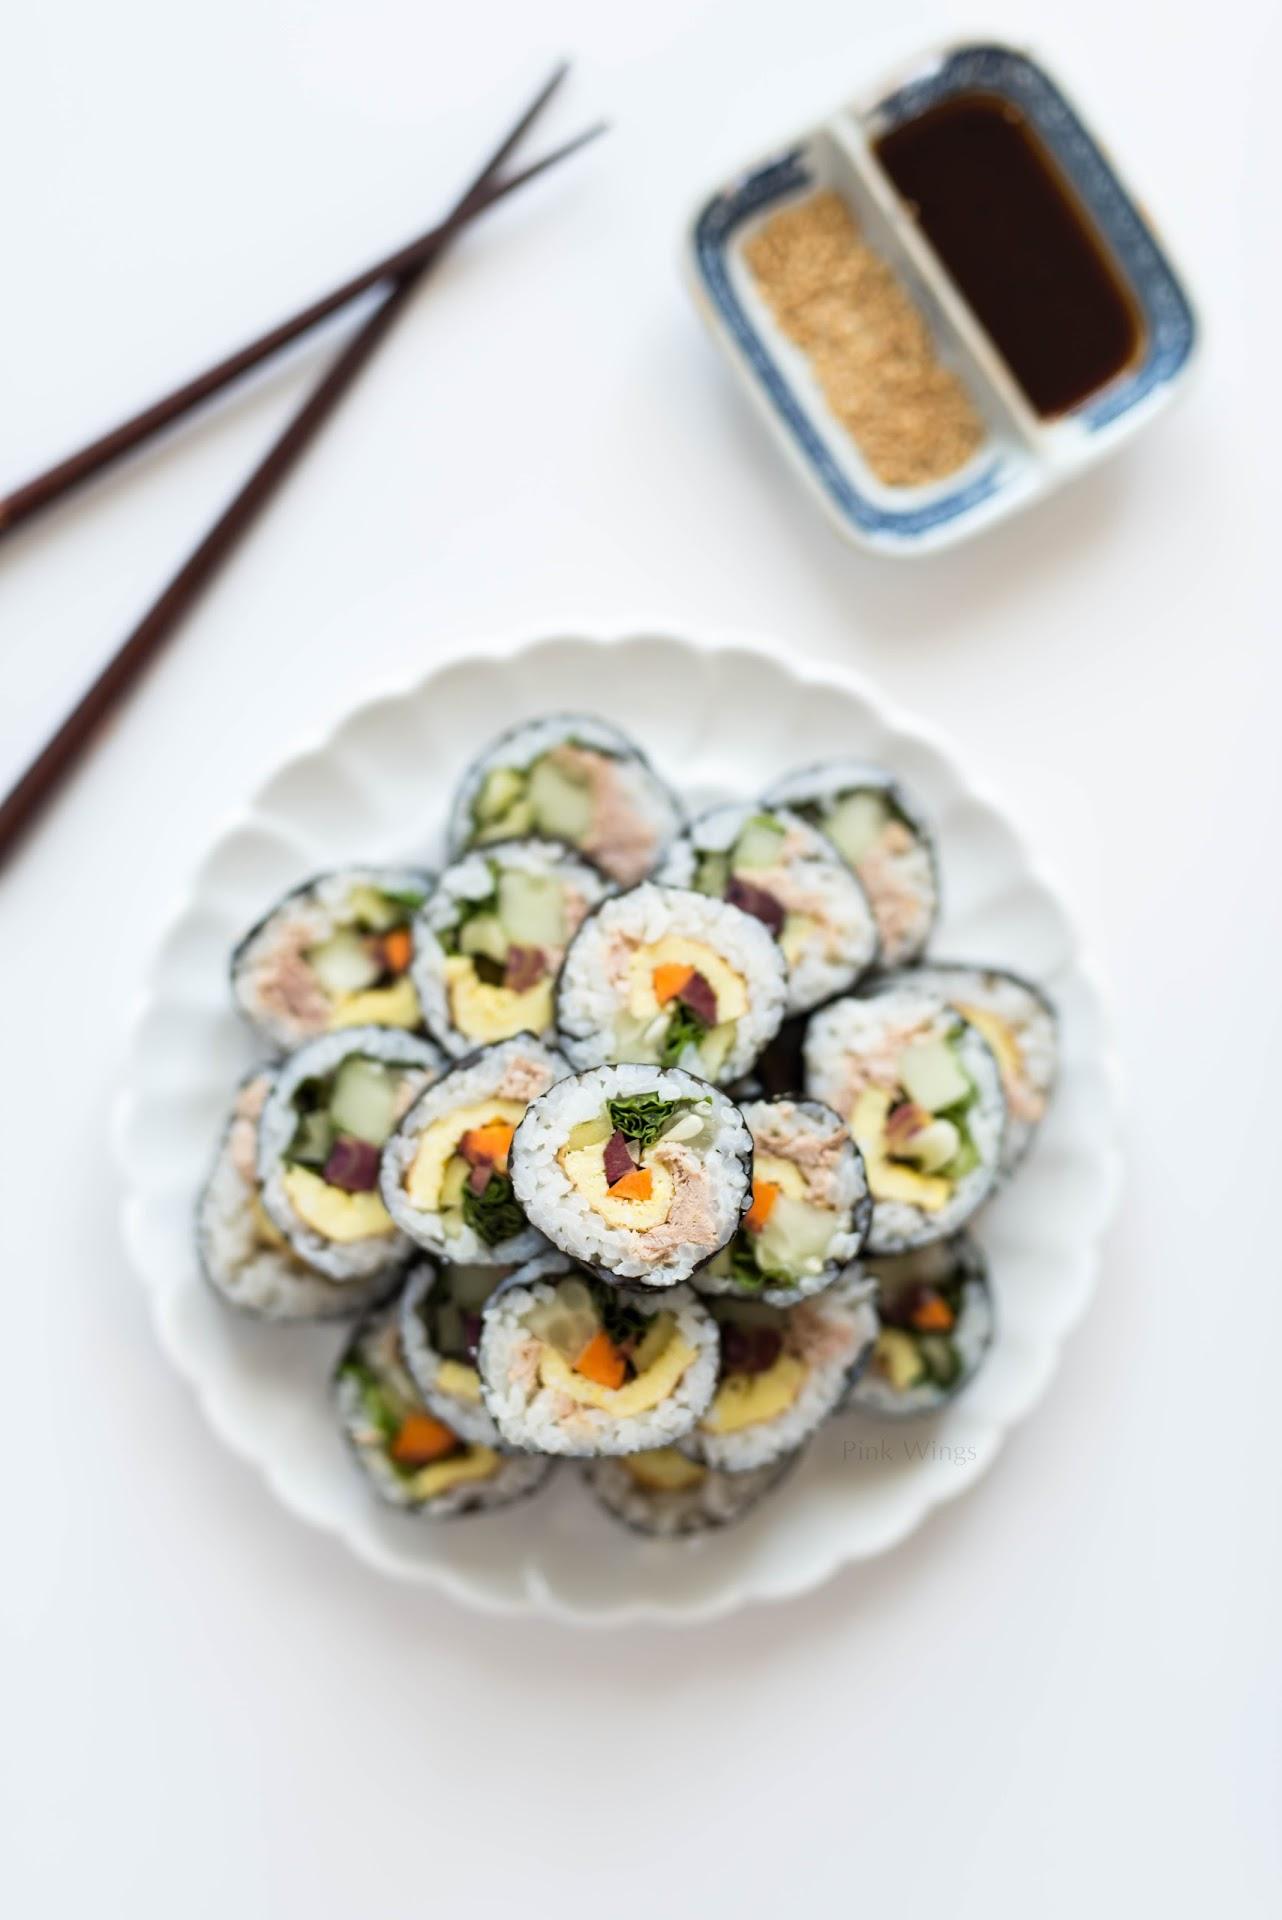 tuna kimbap recipe, korean food blogger, asian, sushi, healthy, veggie wraps, road trip food